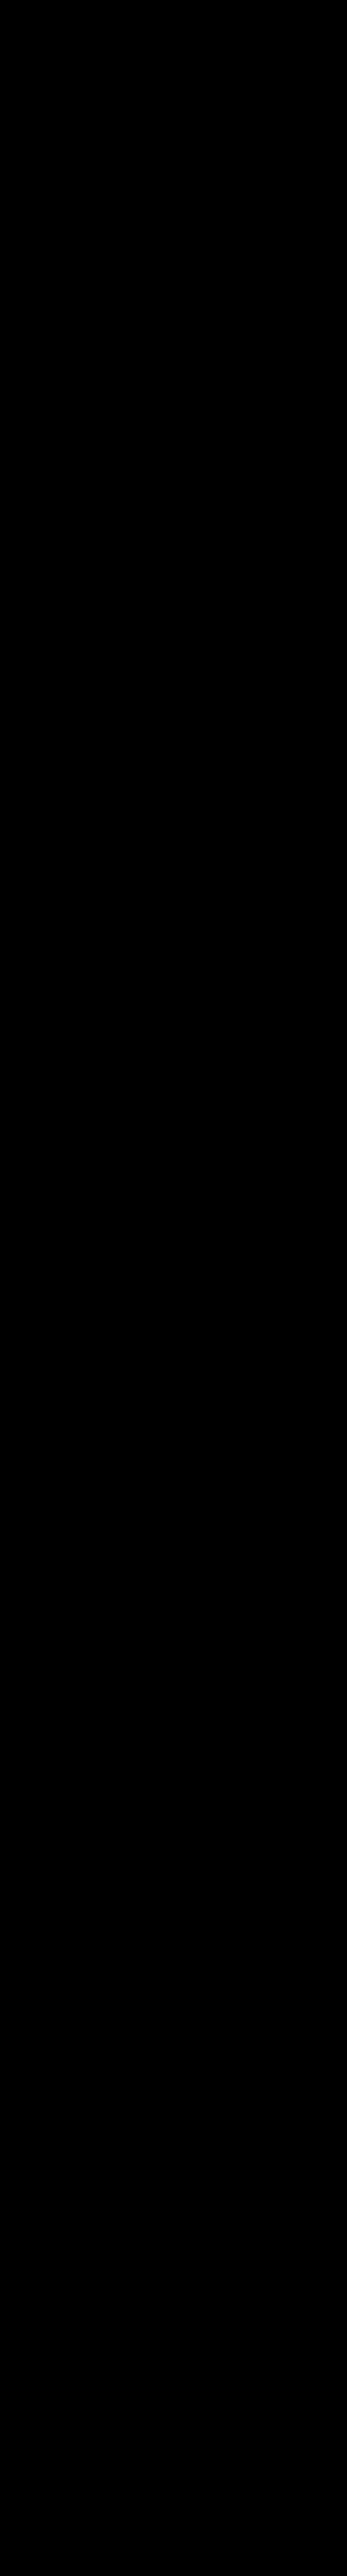 Petroglyph Rattlesnake